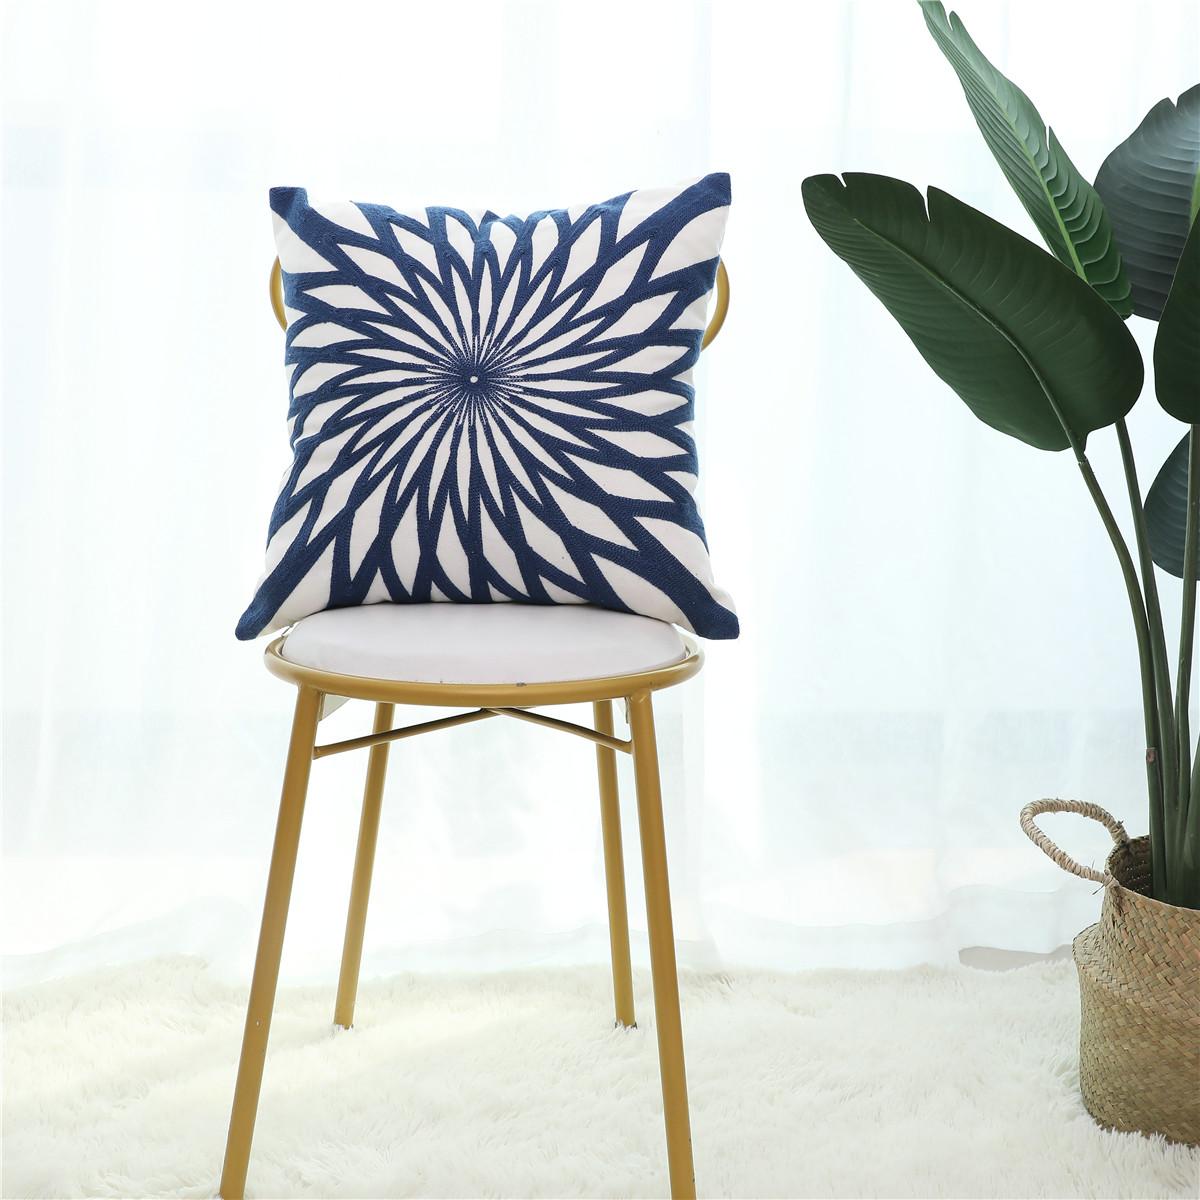 Bedding Soft Decorative Square Cushion Covers 100 Cotton Throw Pillow Cases Sofa Bedroom Car Pillow Covers 18 X18 Blue Walmart Com Walmart Com